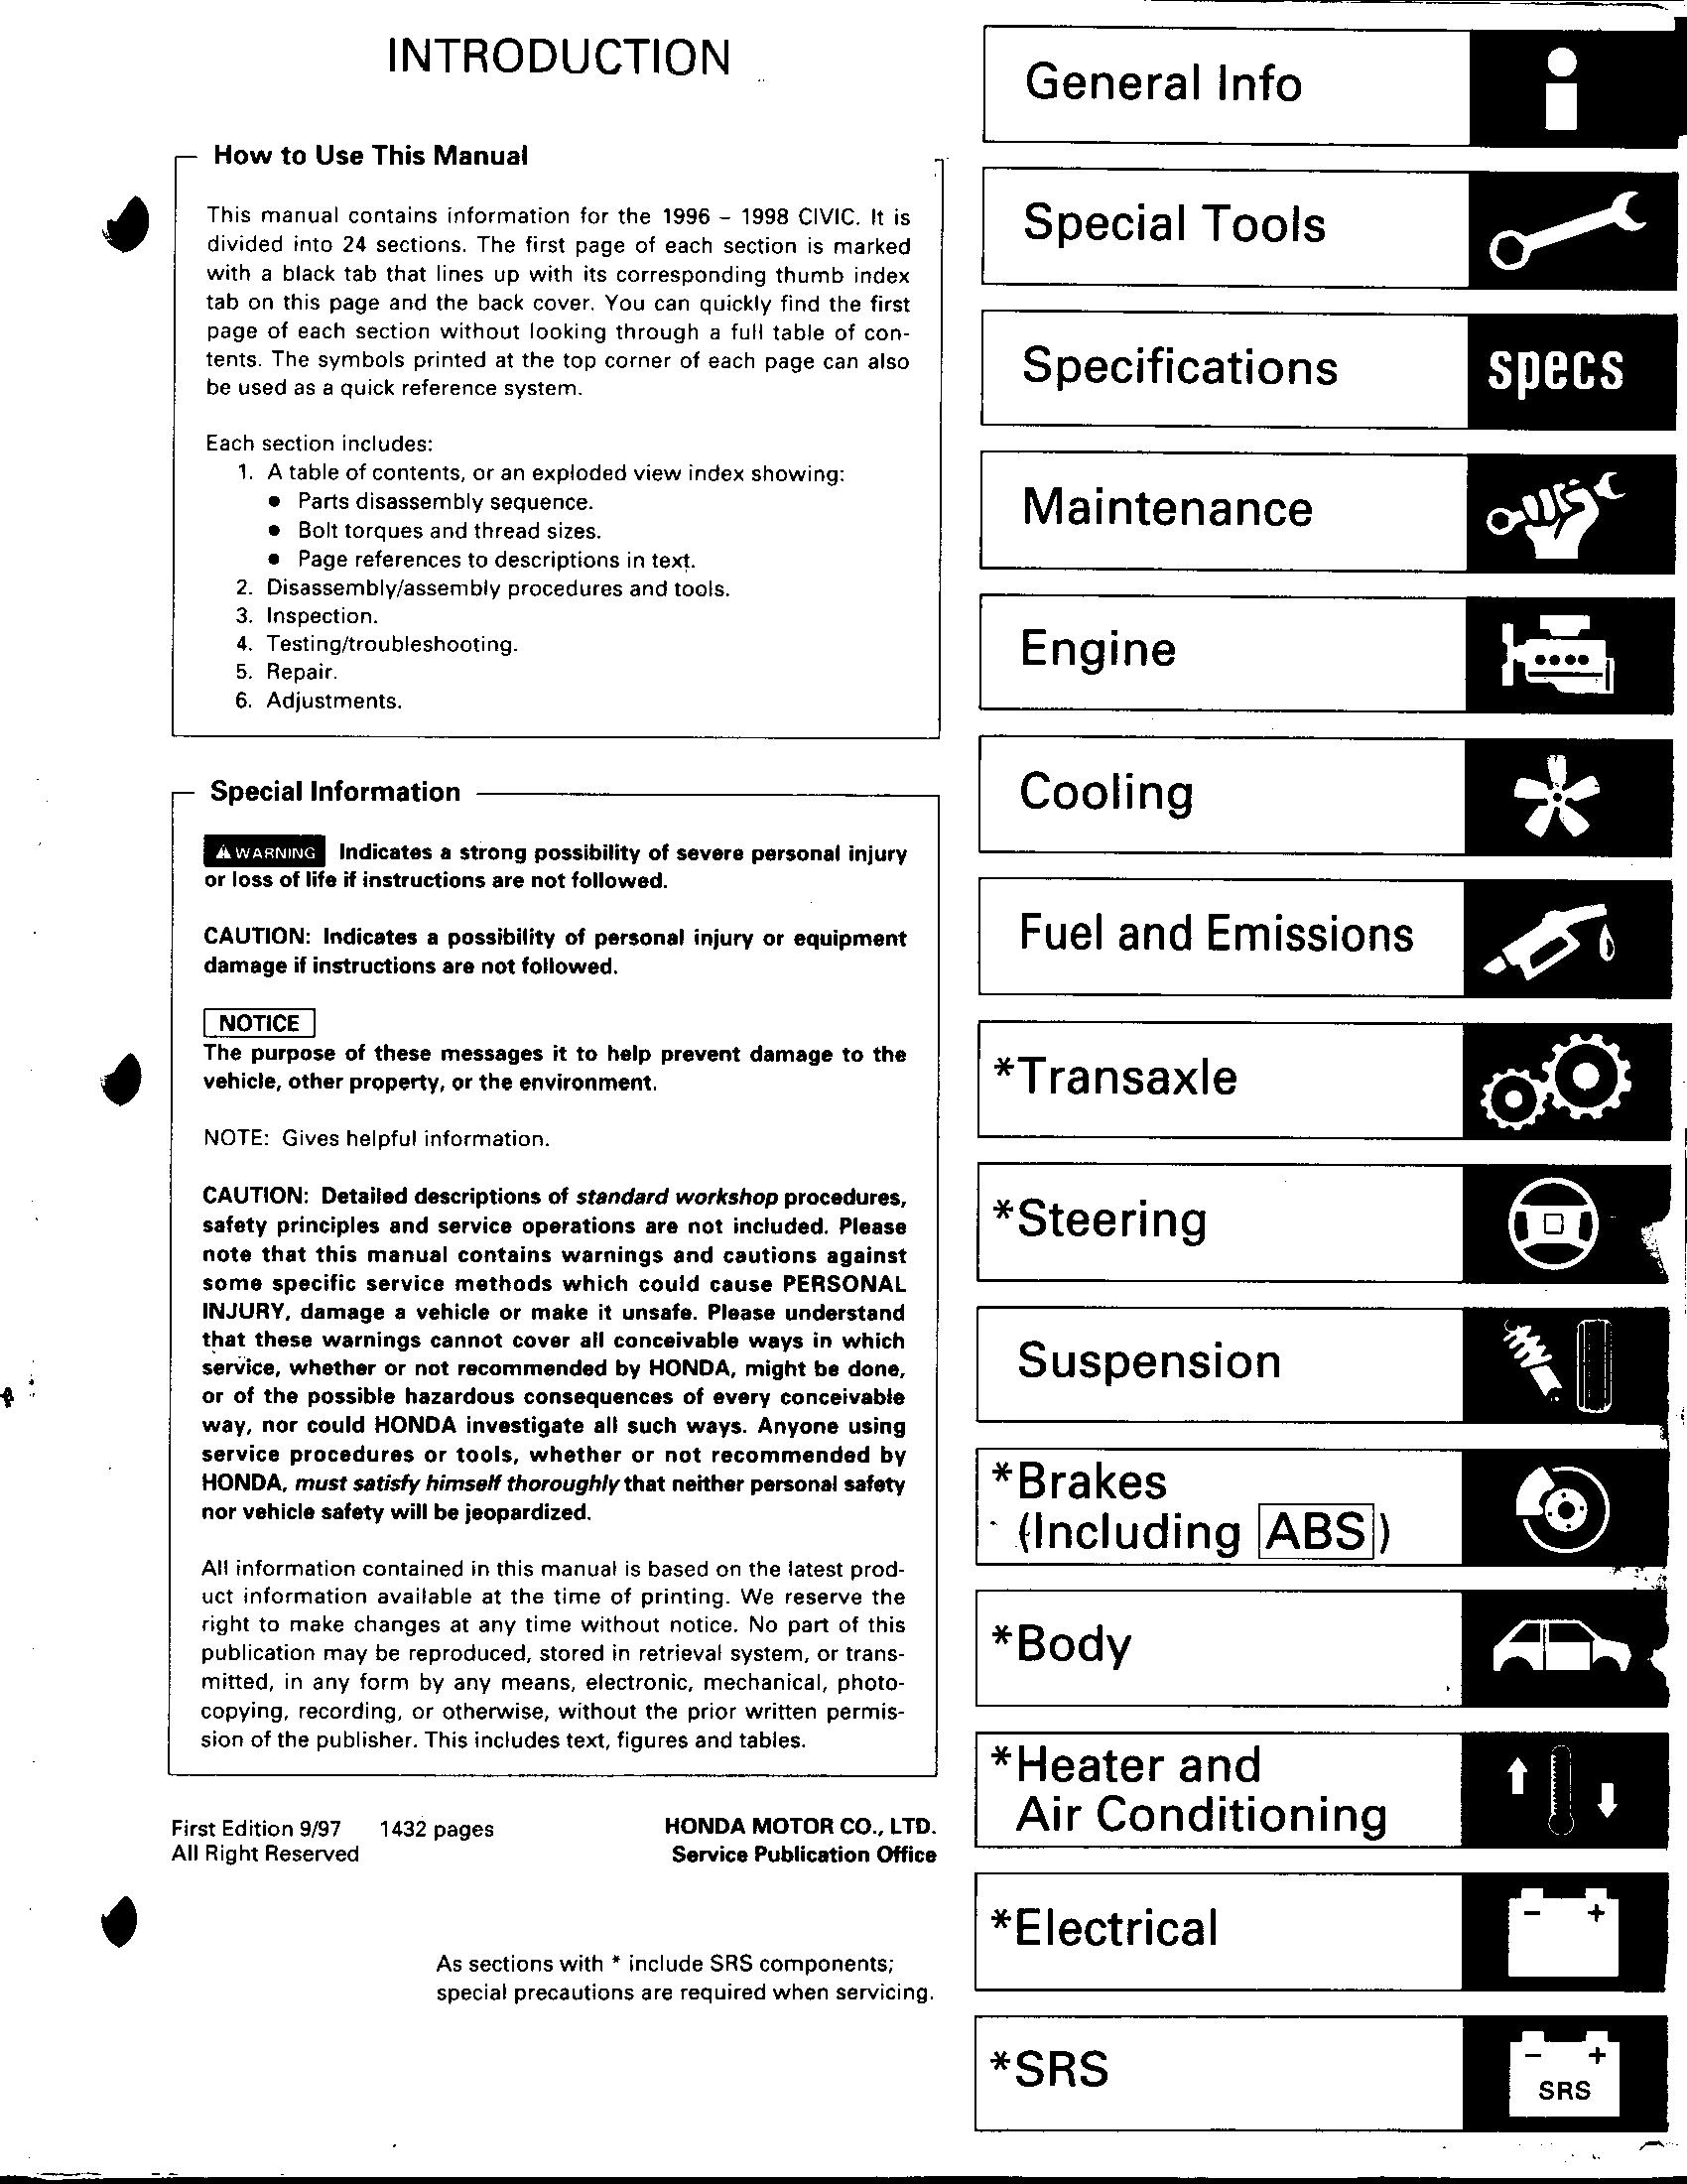 categorization paper prototypes for everyday design rh paperprotos com 96-00 civic service manual 96-00 honda civic service manual